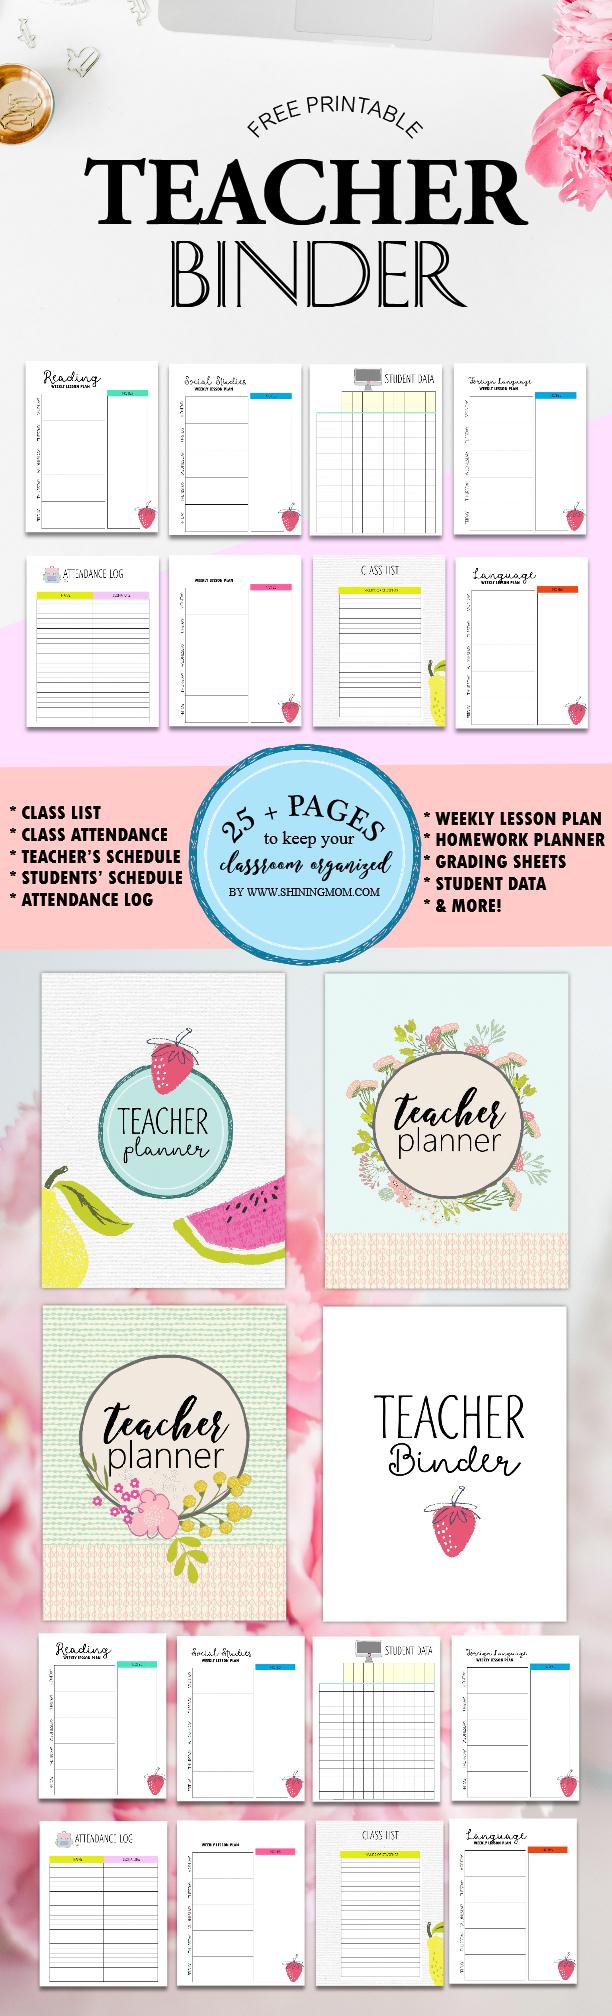 Free Teacher Binder Printables: Over 25 Pretty Planning Templates! - Free Printable Teacher Planner